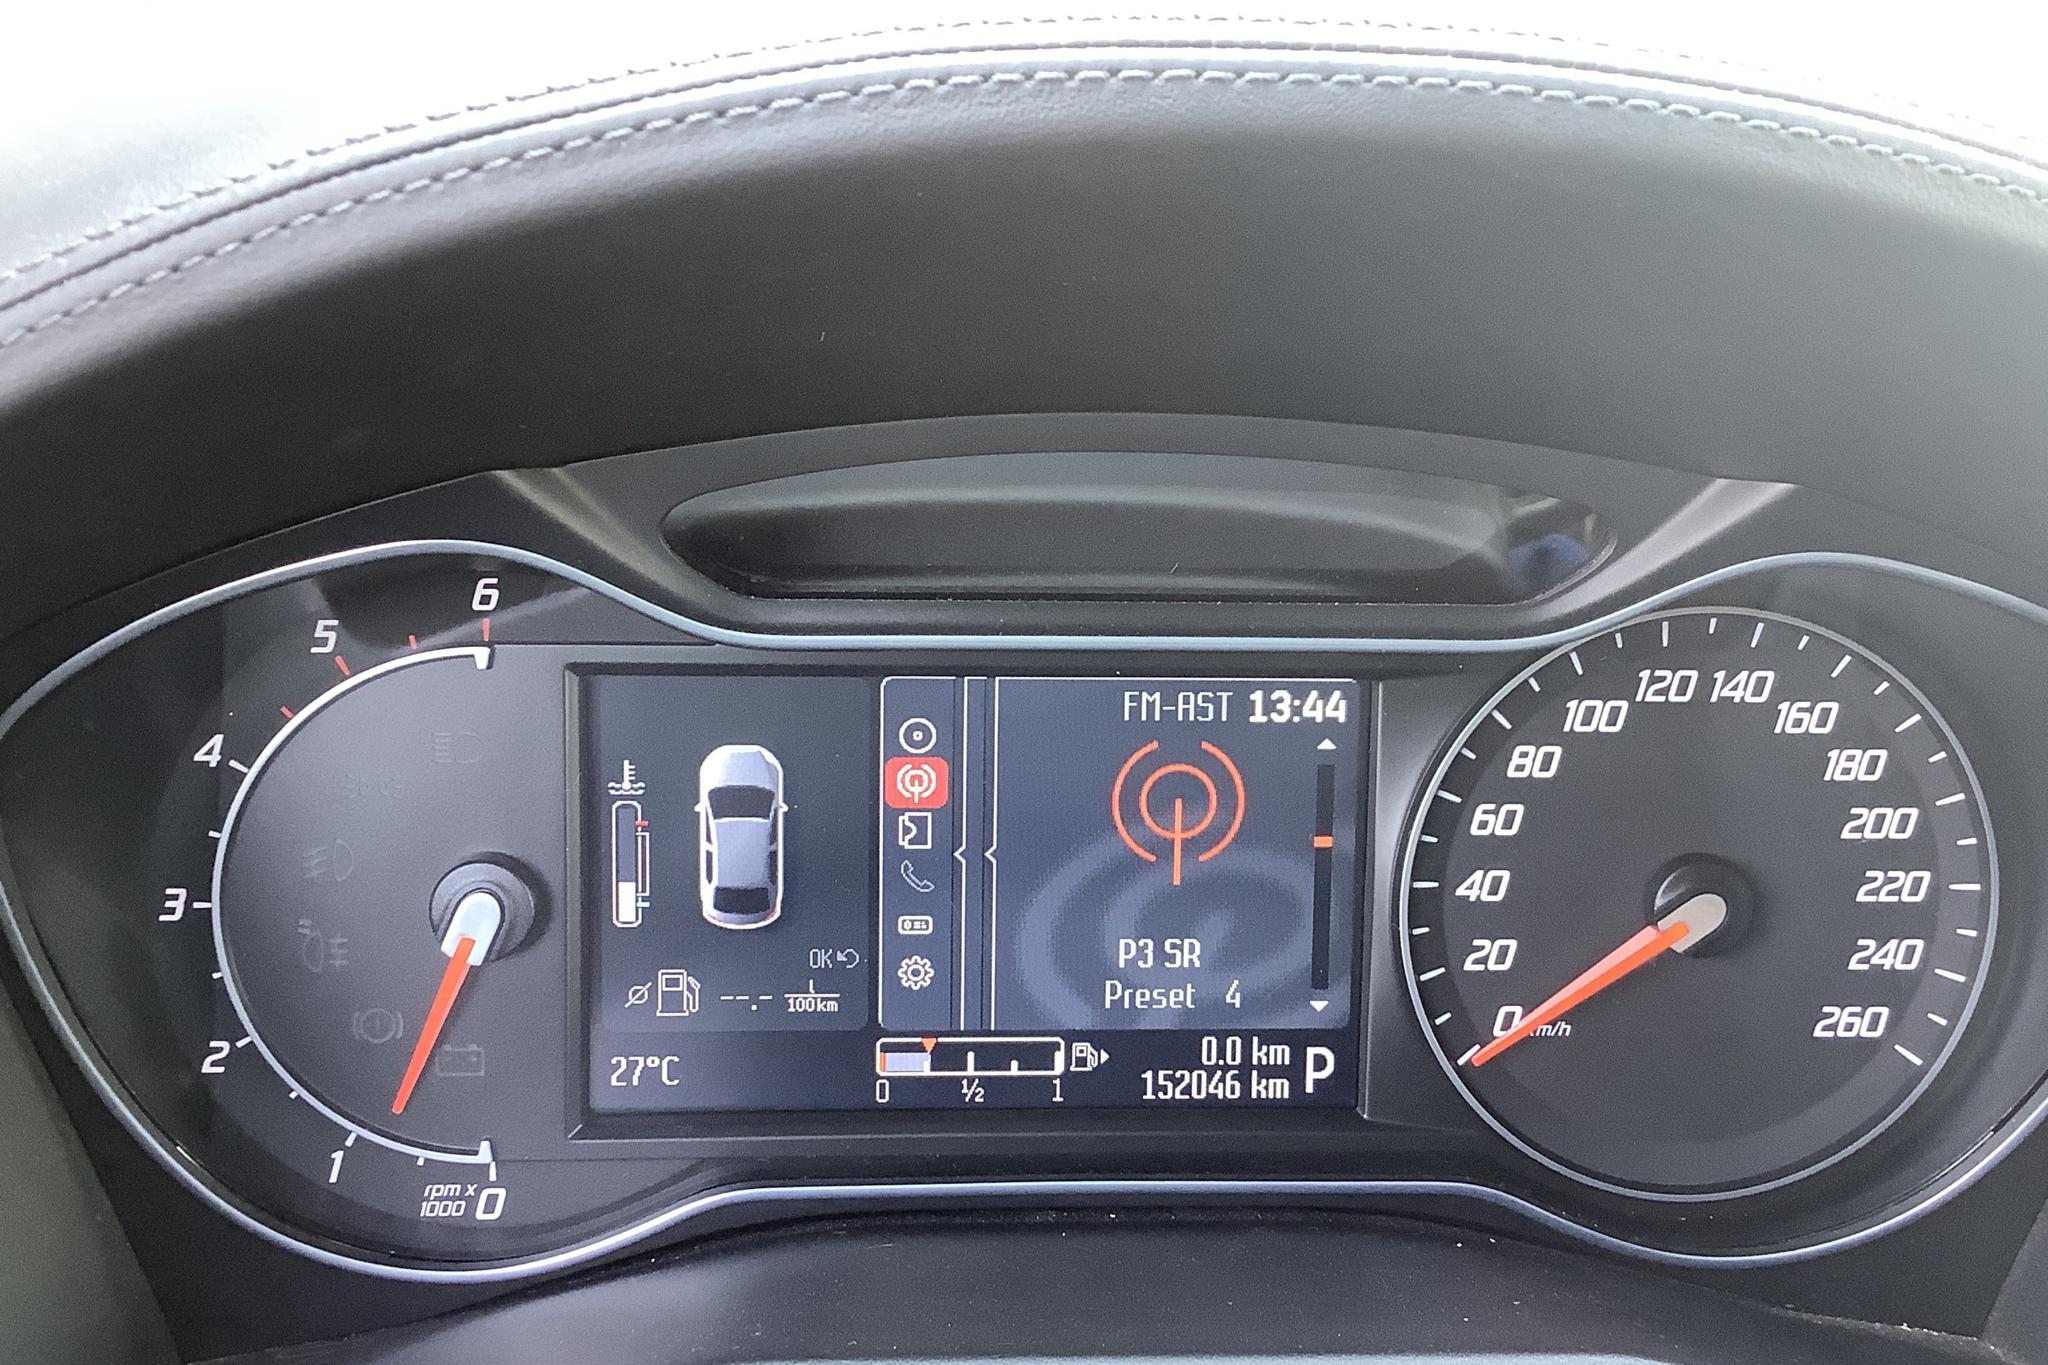 Ford Mondeo 2.0 Duratorq TDCi Kombi (163hk) - 152 040 km - Automatic - white - 2013